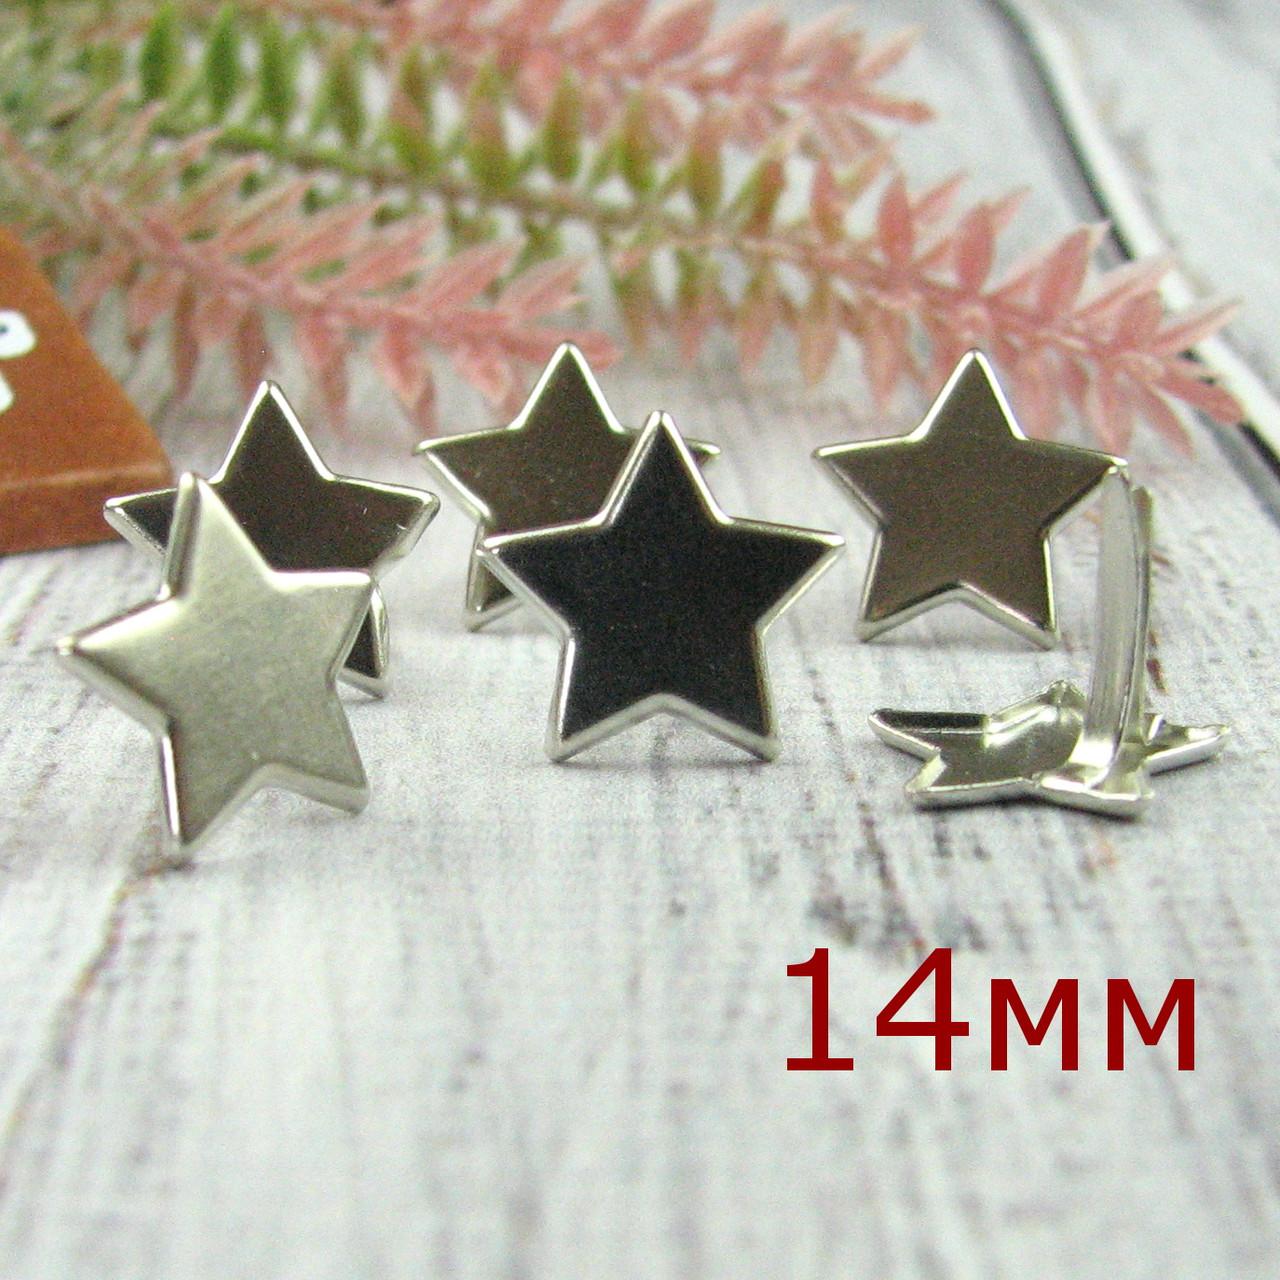 Брадсы для рукоделия 14*11мм Звезды 10шт в наборе